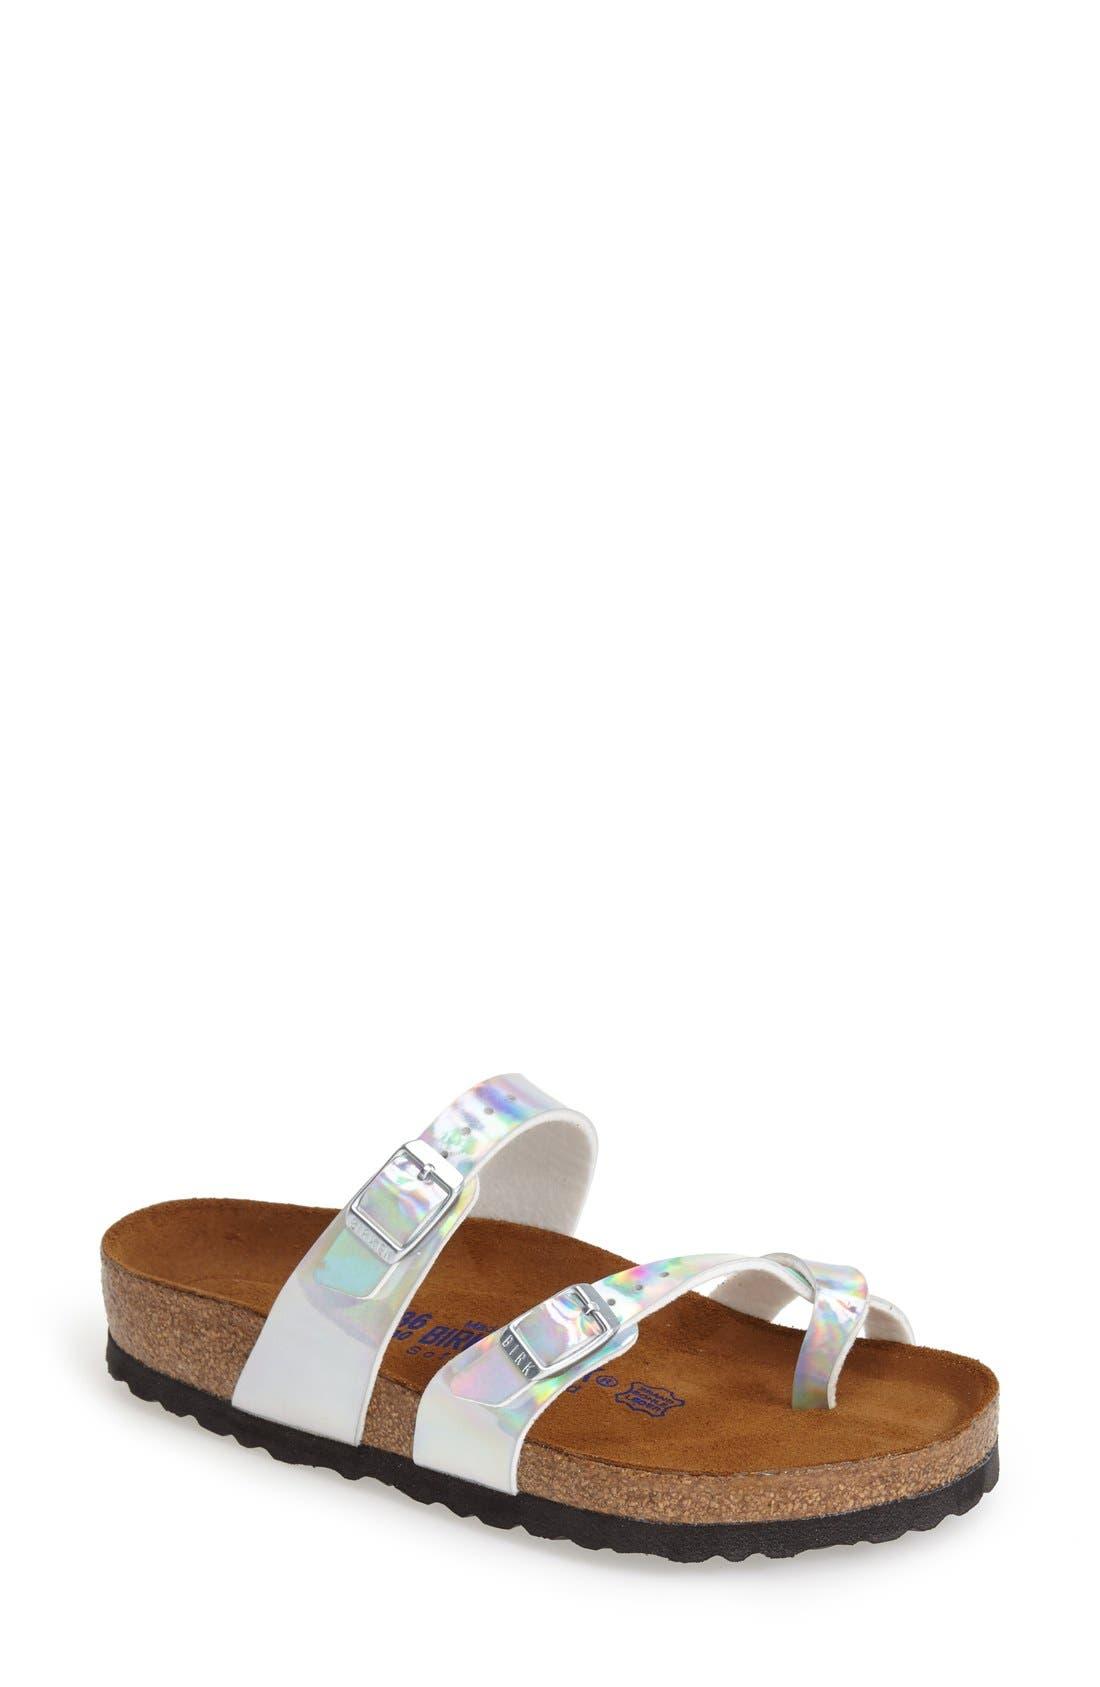 'Mayari' Birko-Flor<sup>™</sup> Sandal,                             Main thumbnail 1, color,                             040